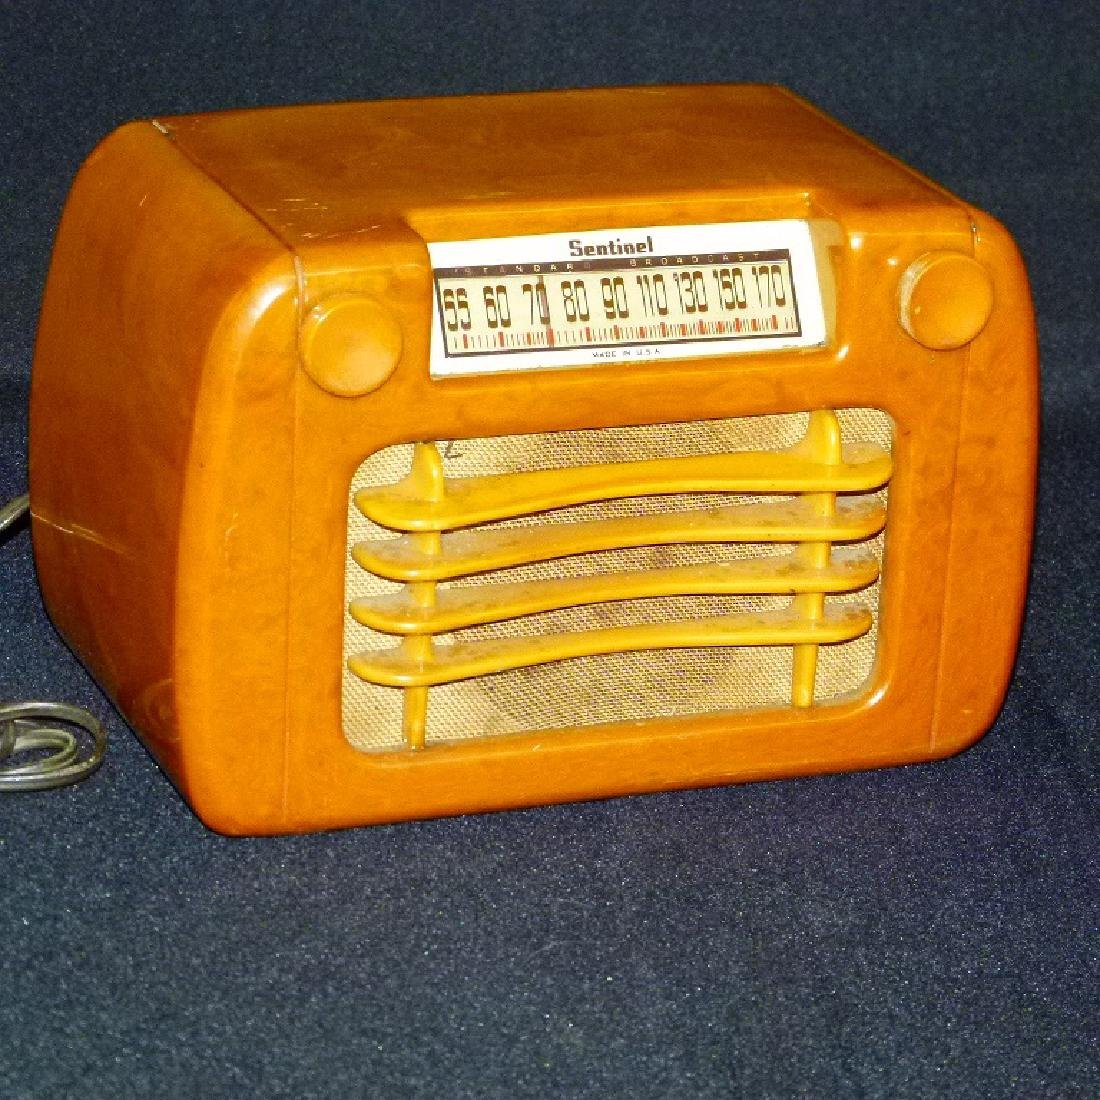 SENTINEL BUTTERSCOTCH CATLIN/BAKELITE TABLE TOP RADIO